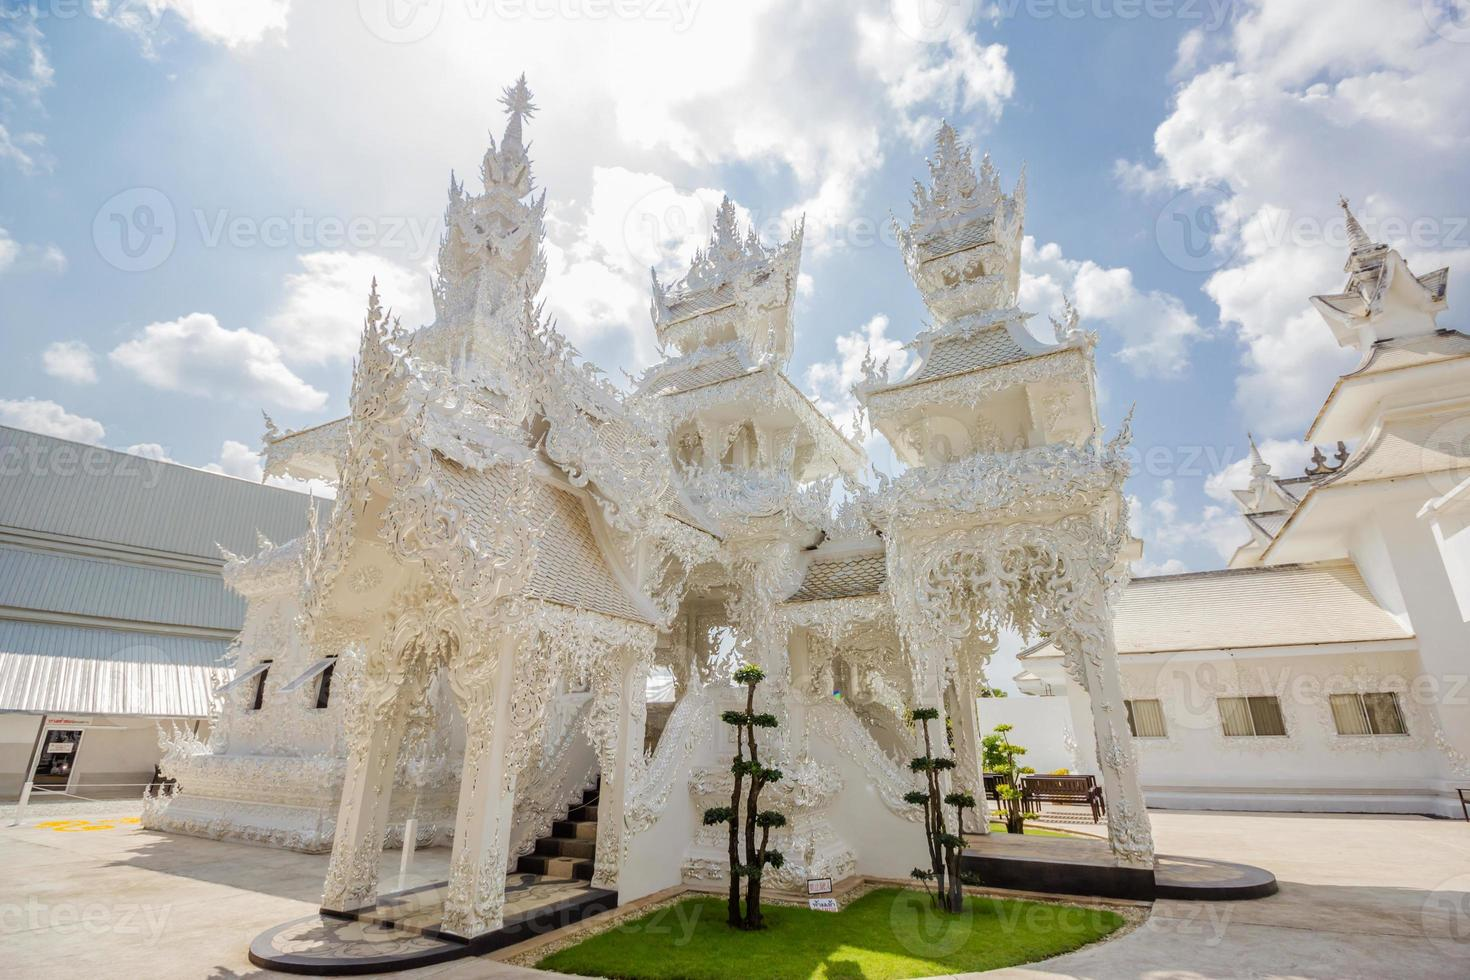 tempio della Tailandia - Wat Rong Khun di Chiangrai Tailandia foto